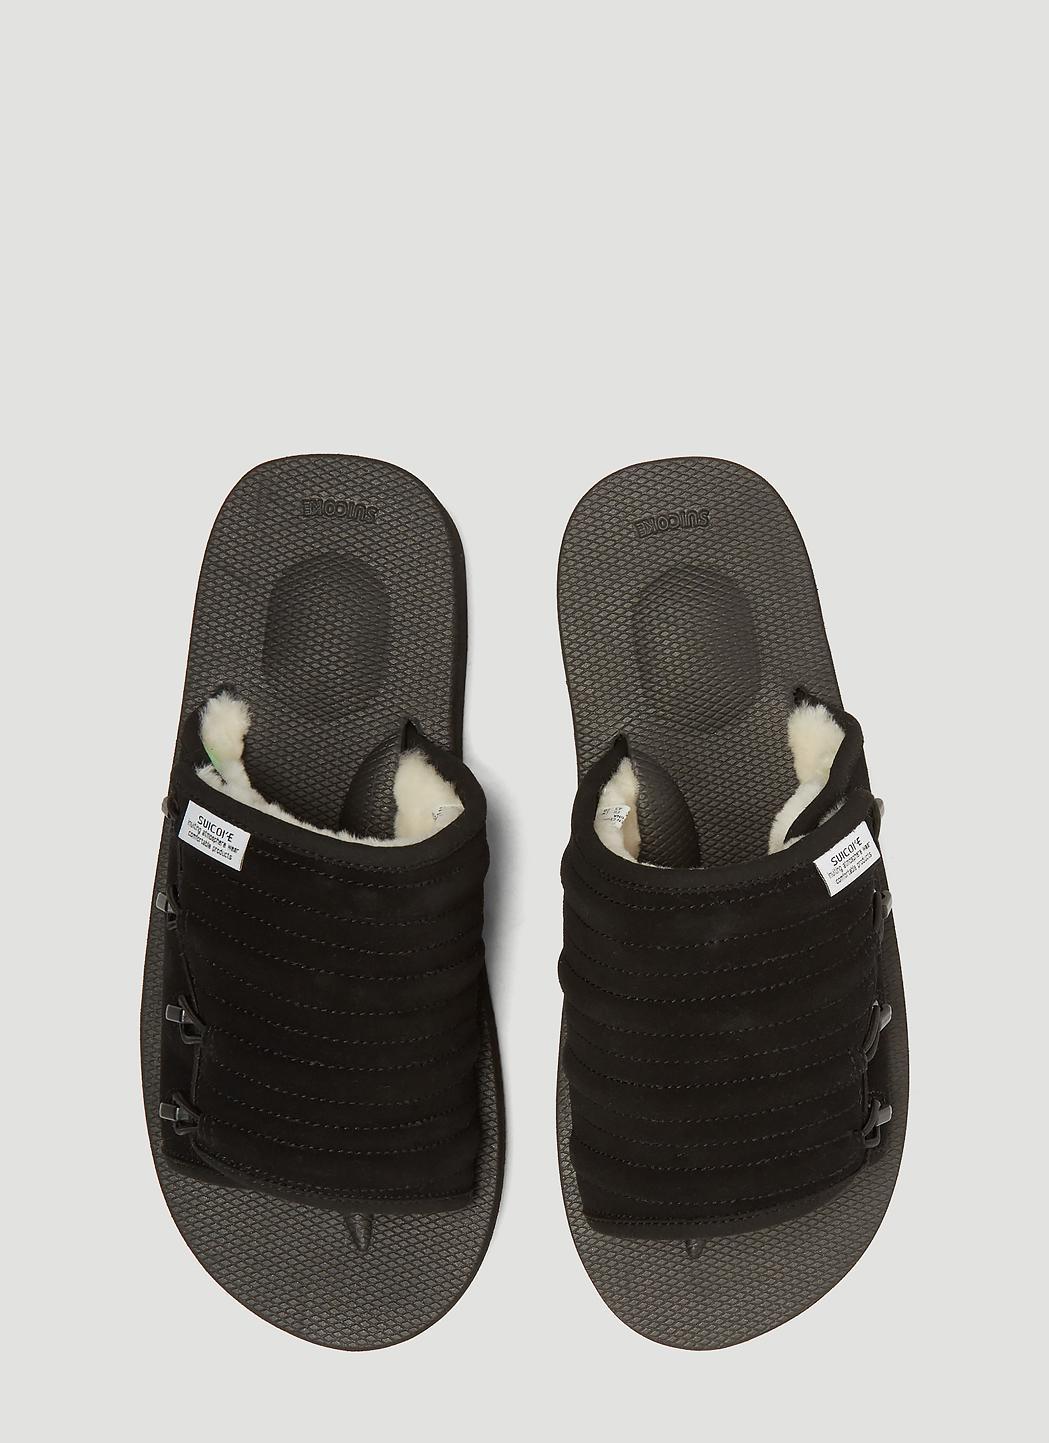 cf179730582e Suicoke - Mura Mab Sandals In Black for Men - Lyst. View fullscreen